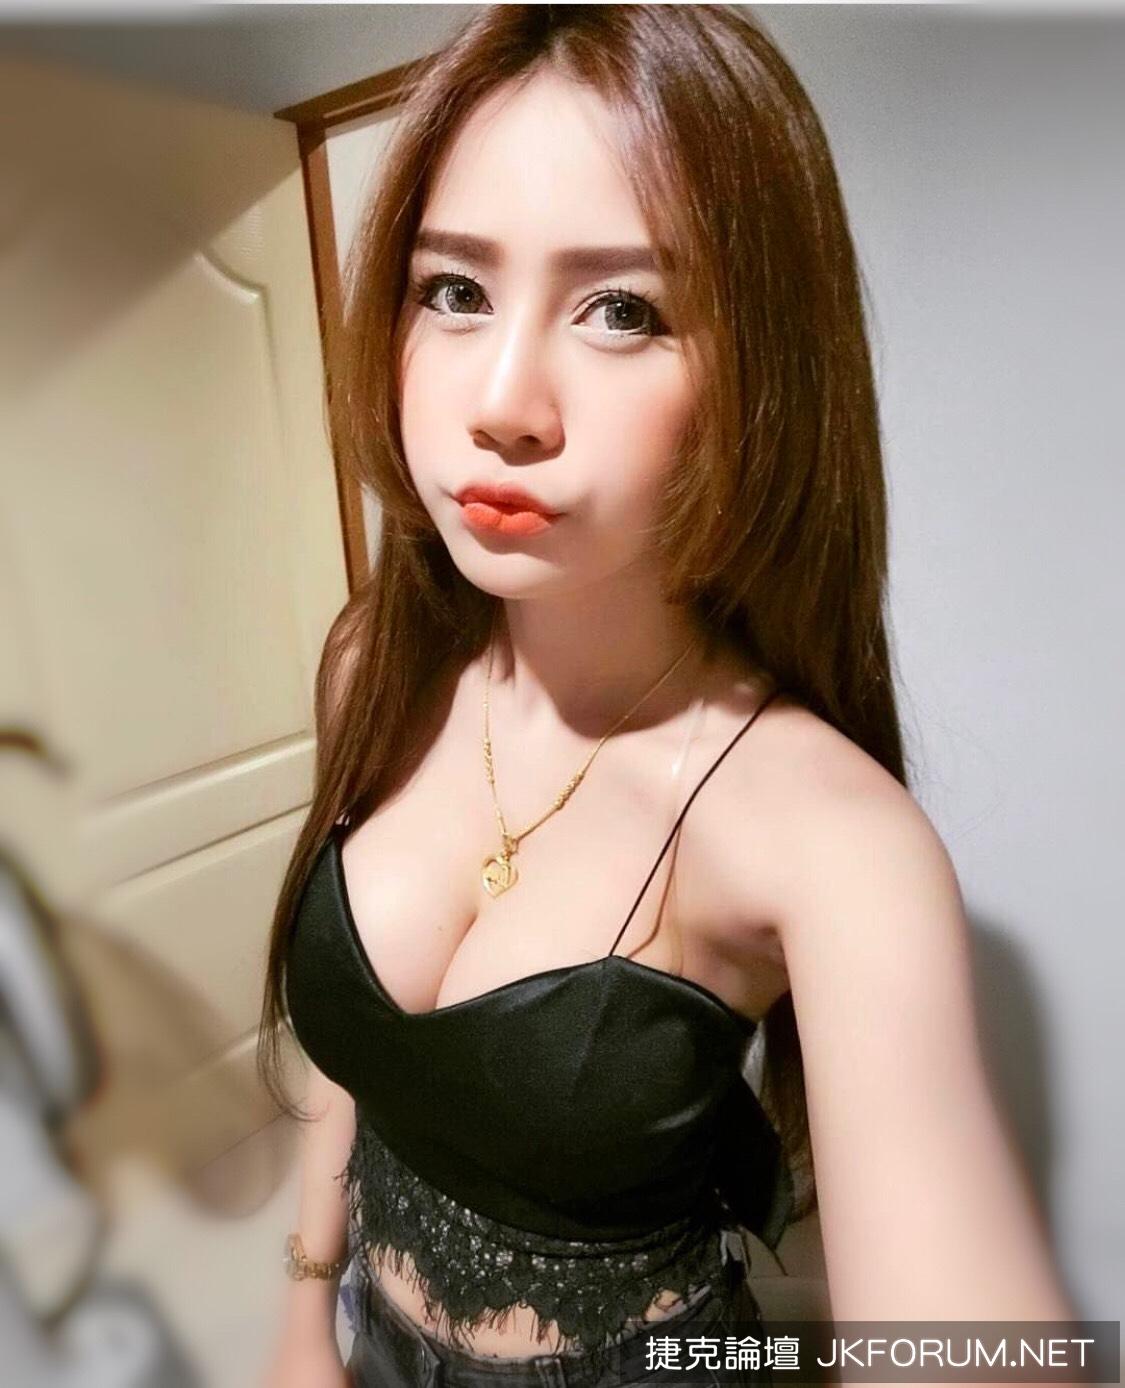 S__5029989.jpg